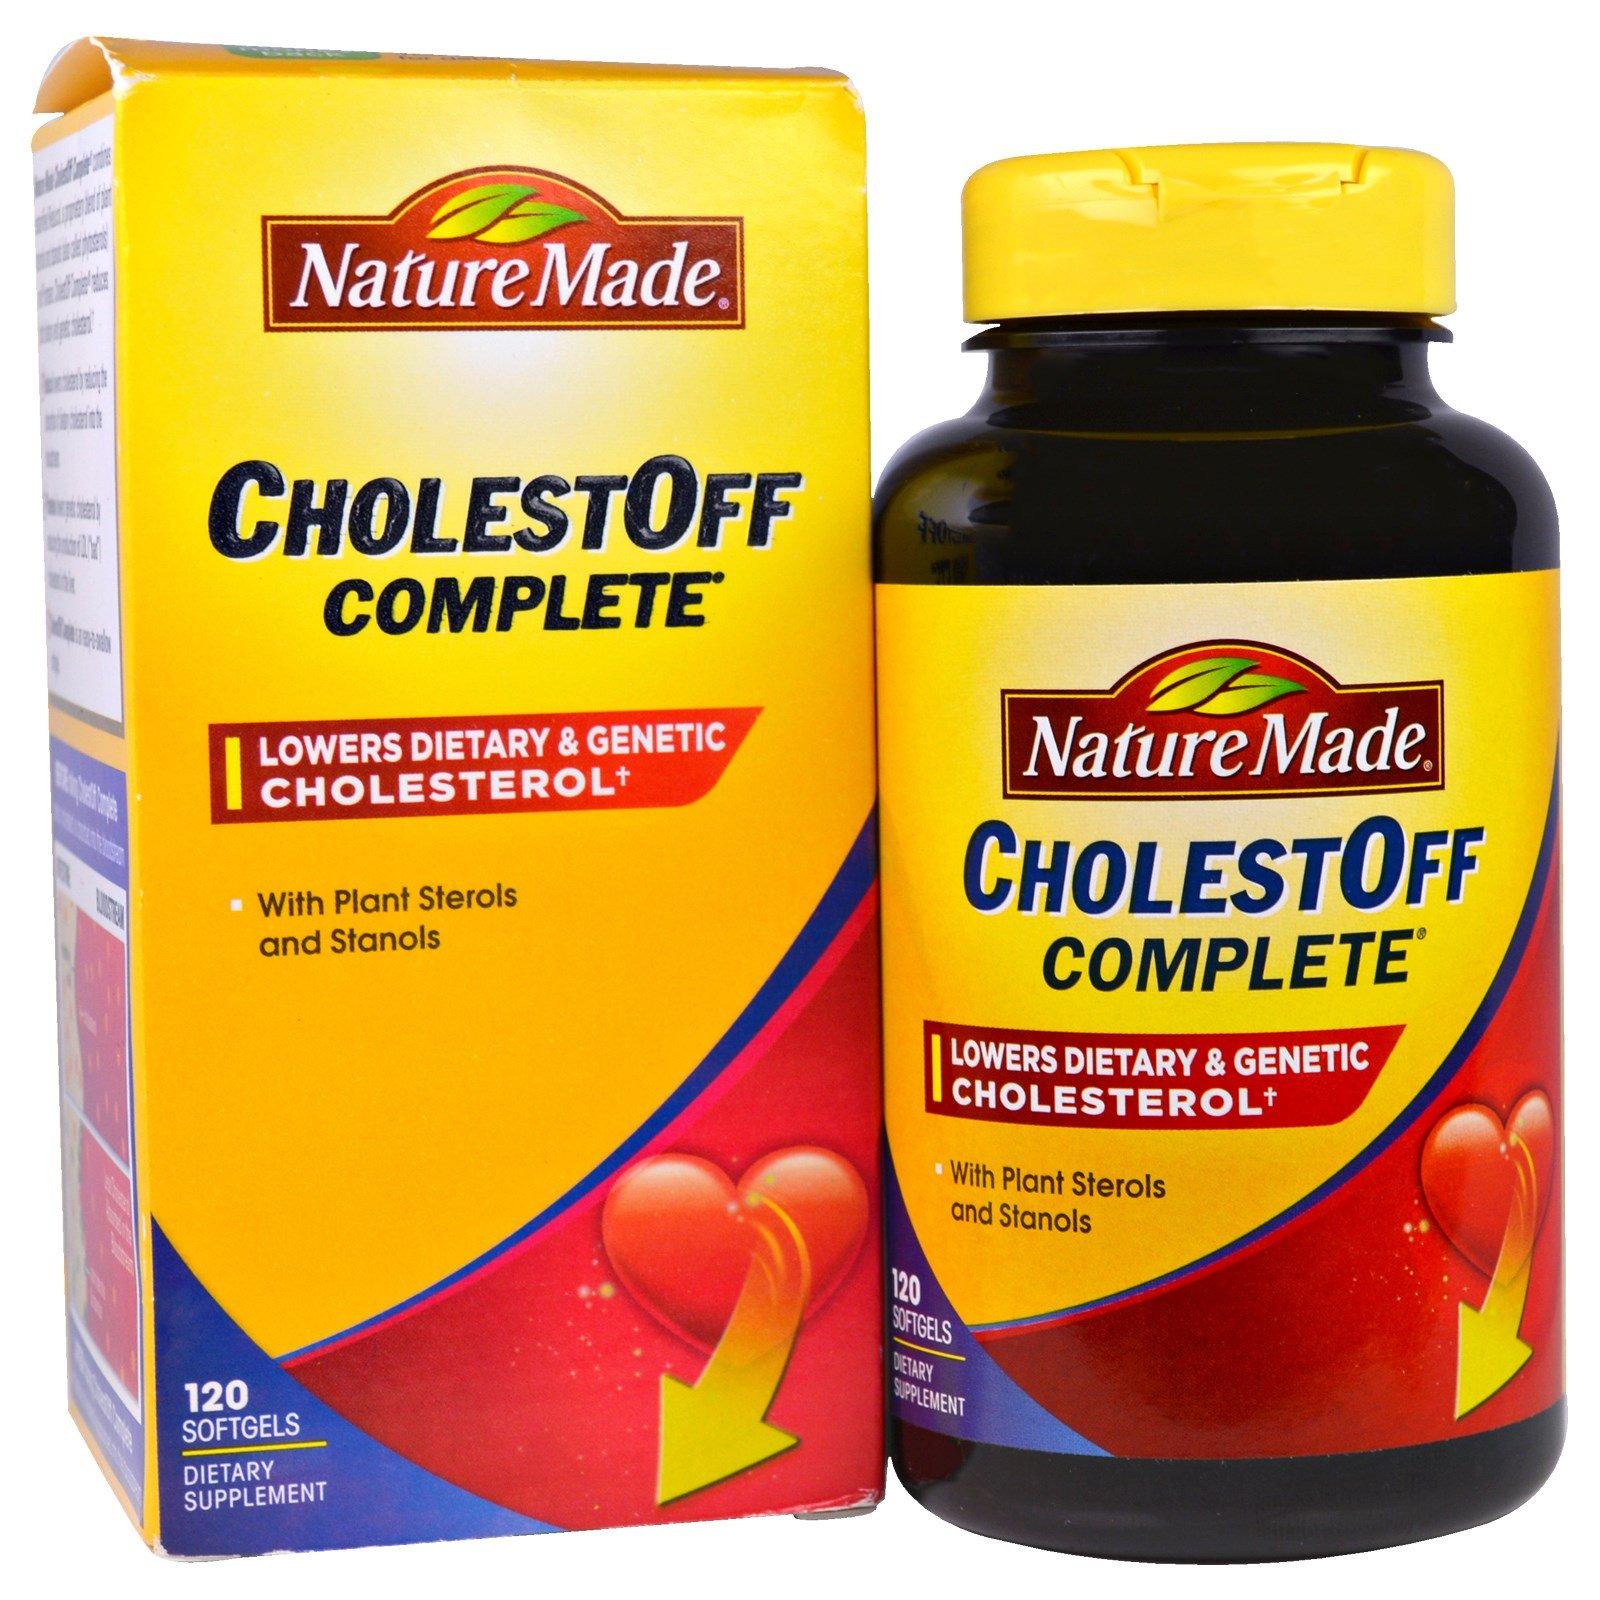 NatureMade CholestOff Complete